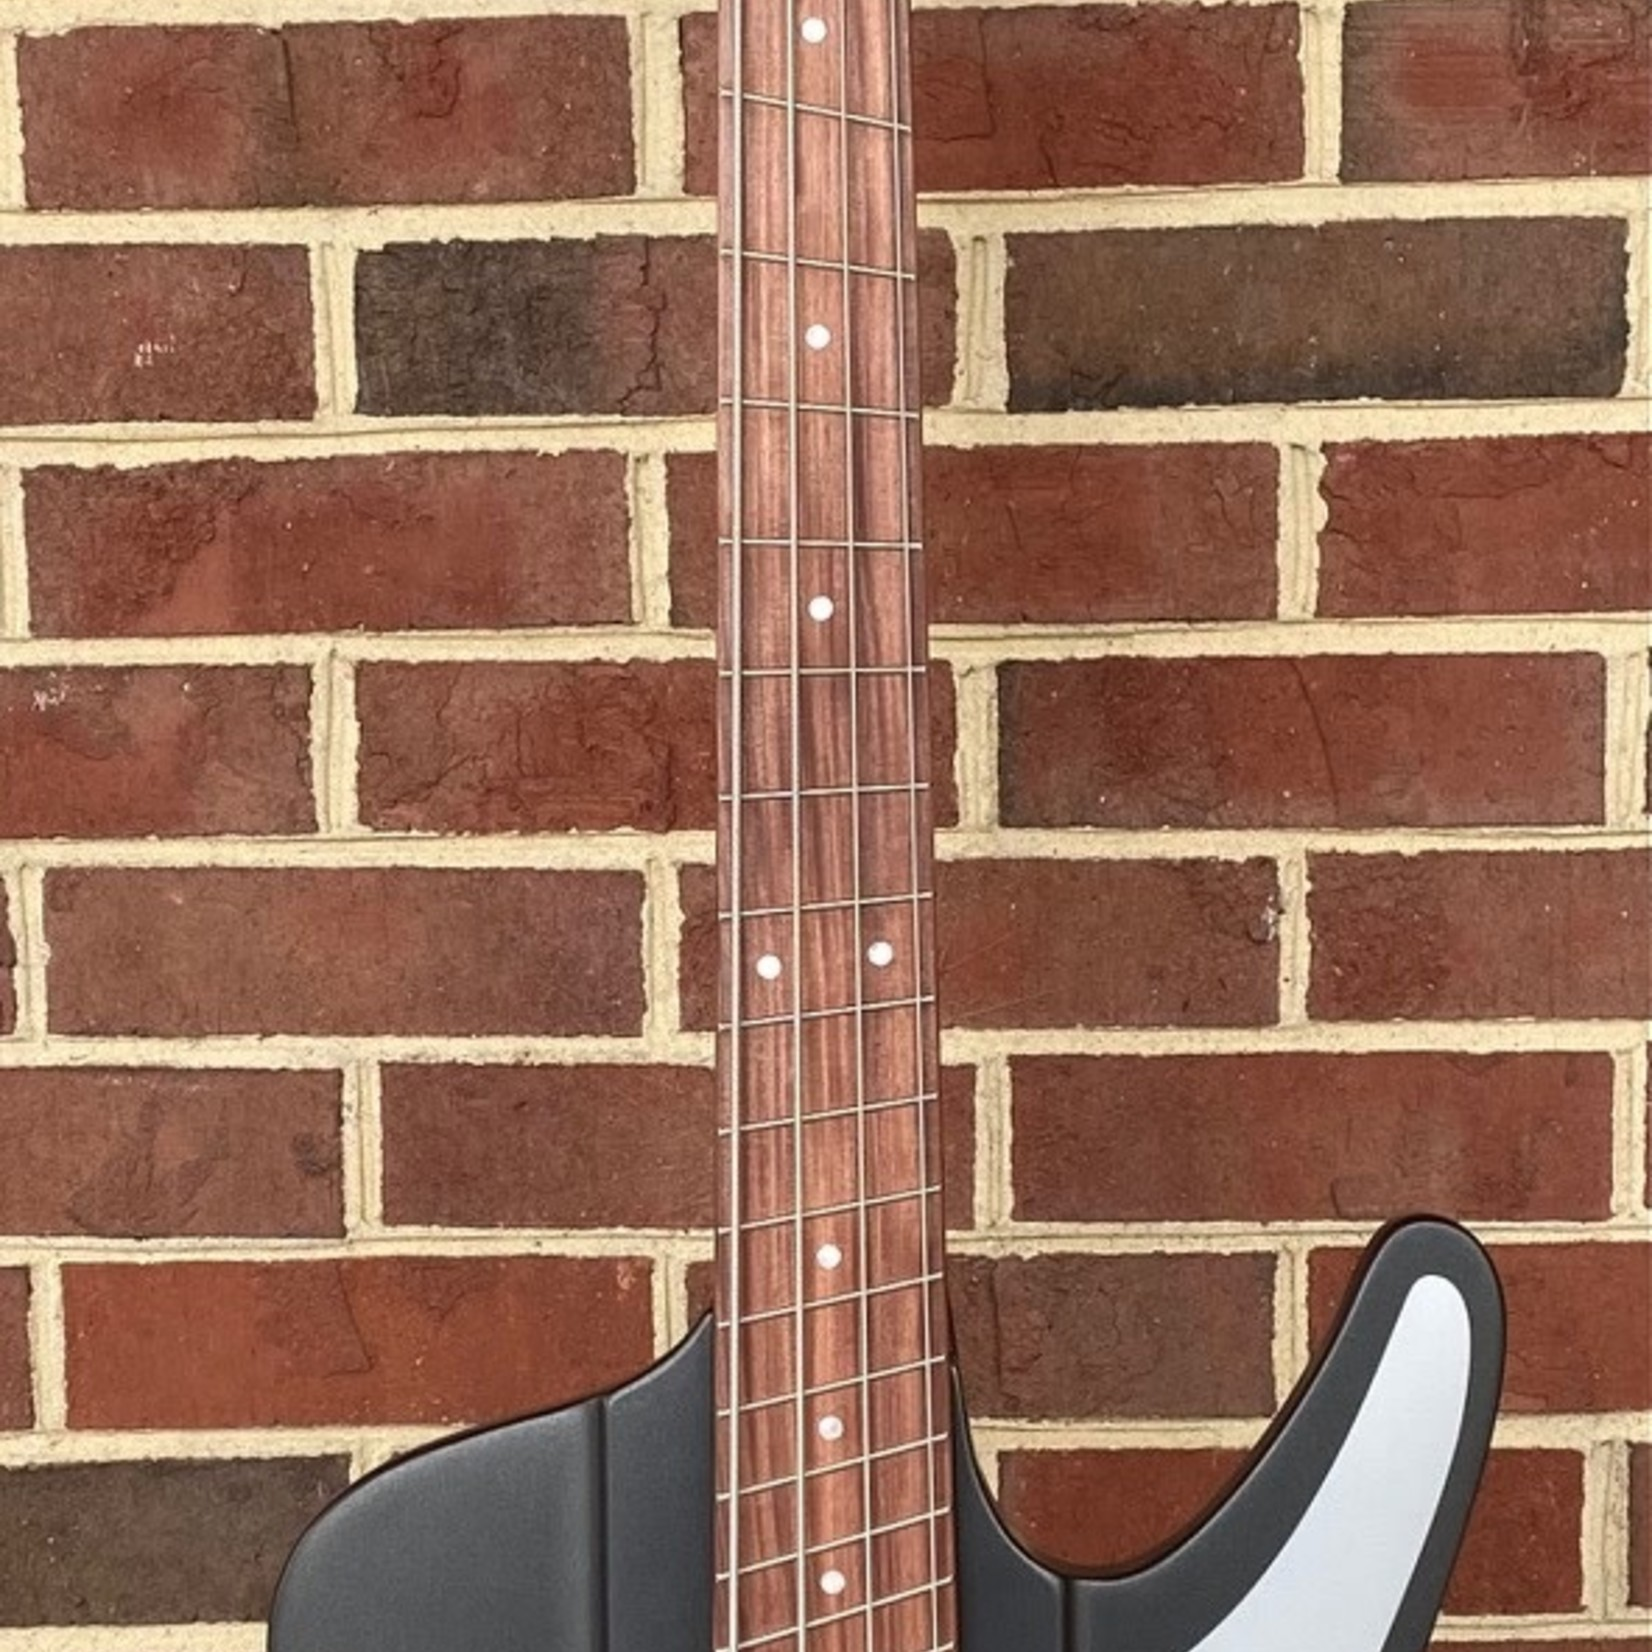 Dingwall Dingwall D-Roc Standard 4-String, Matte Metallic Black, Pau Ferro Fretboard, Dingwall Gig Bag, SN# 9271